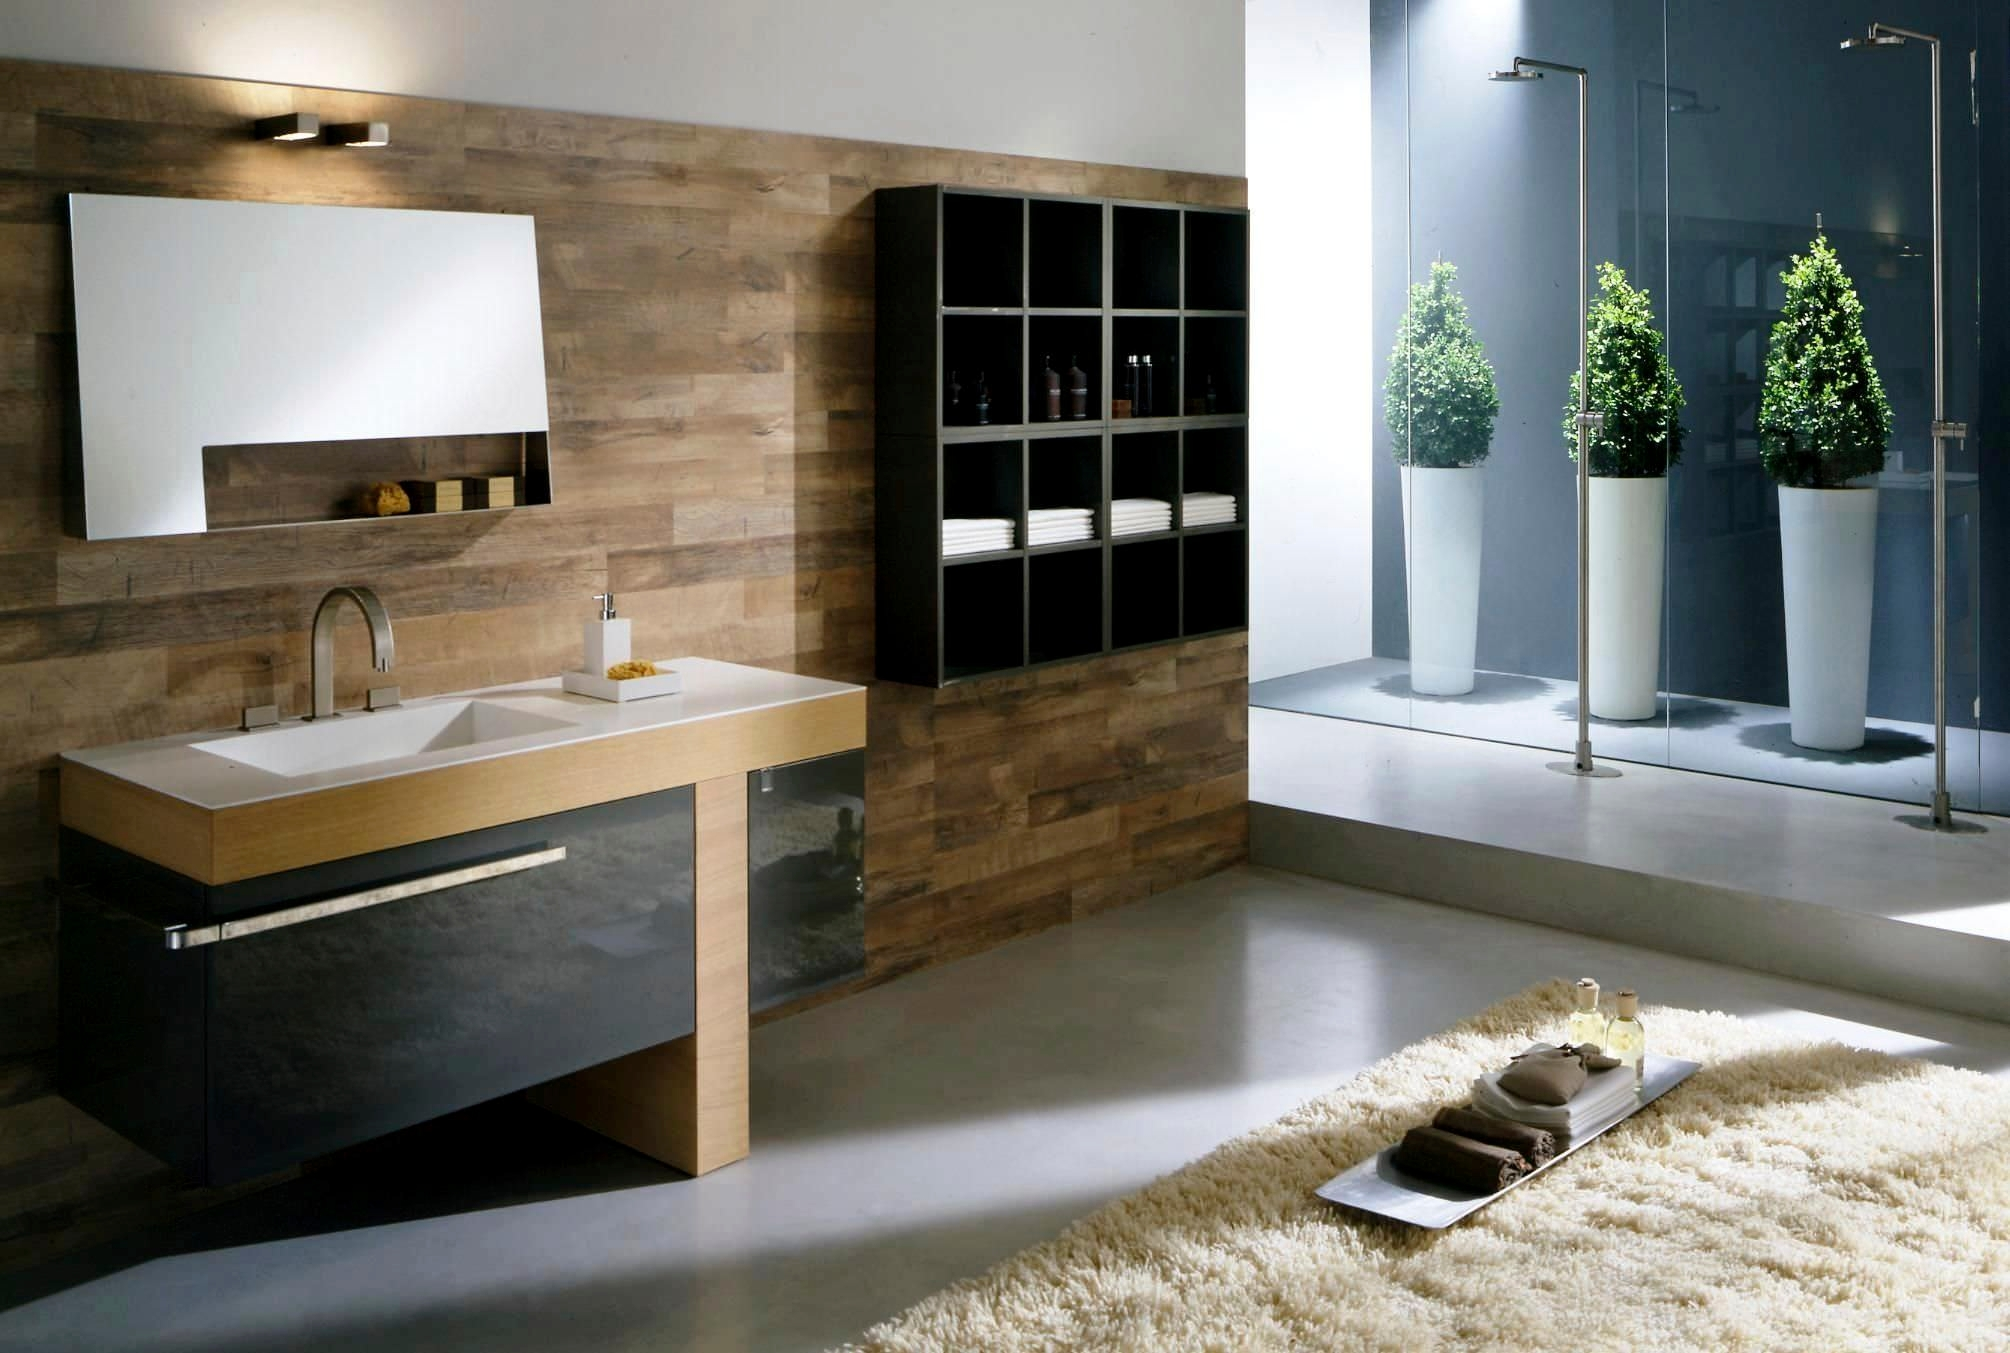 Modern Bathroom Design Ideas For